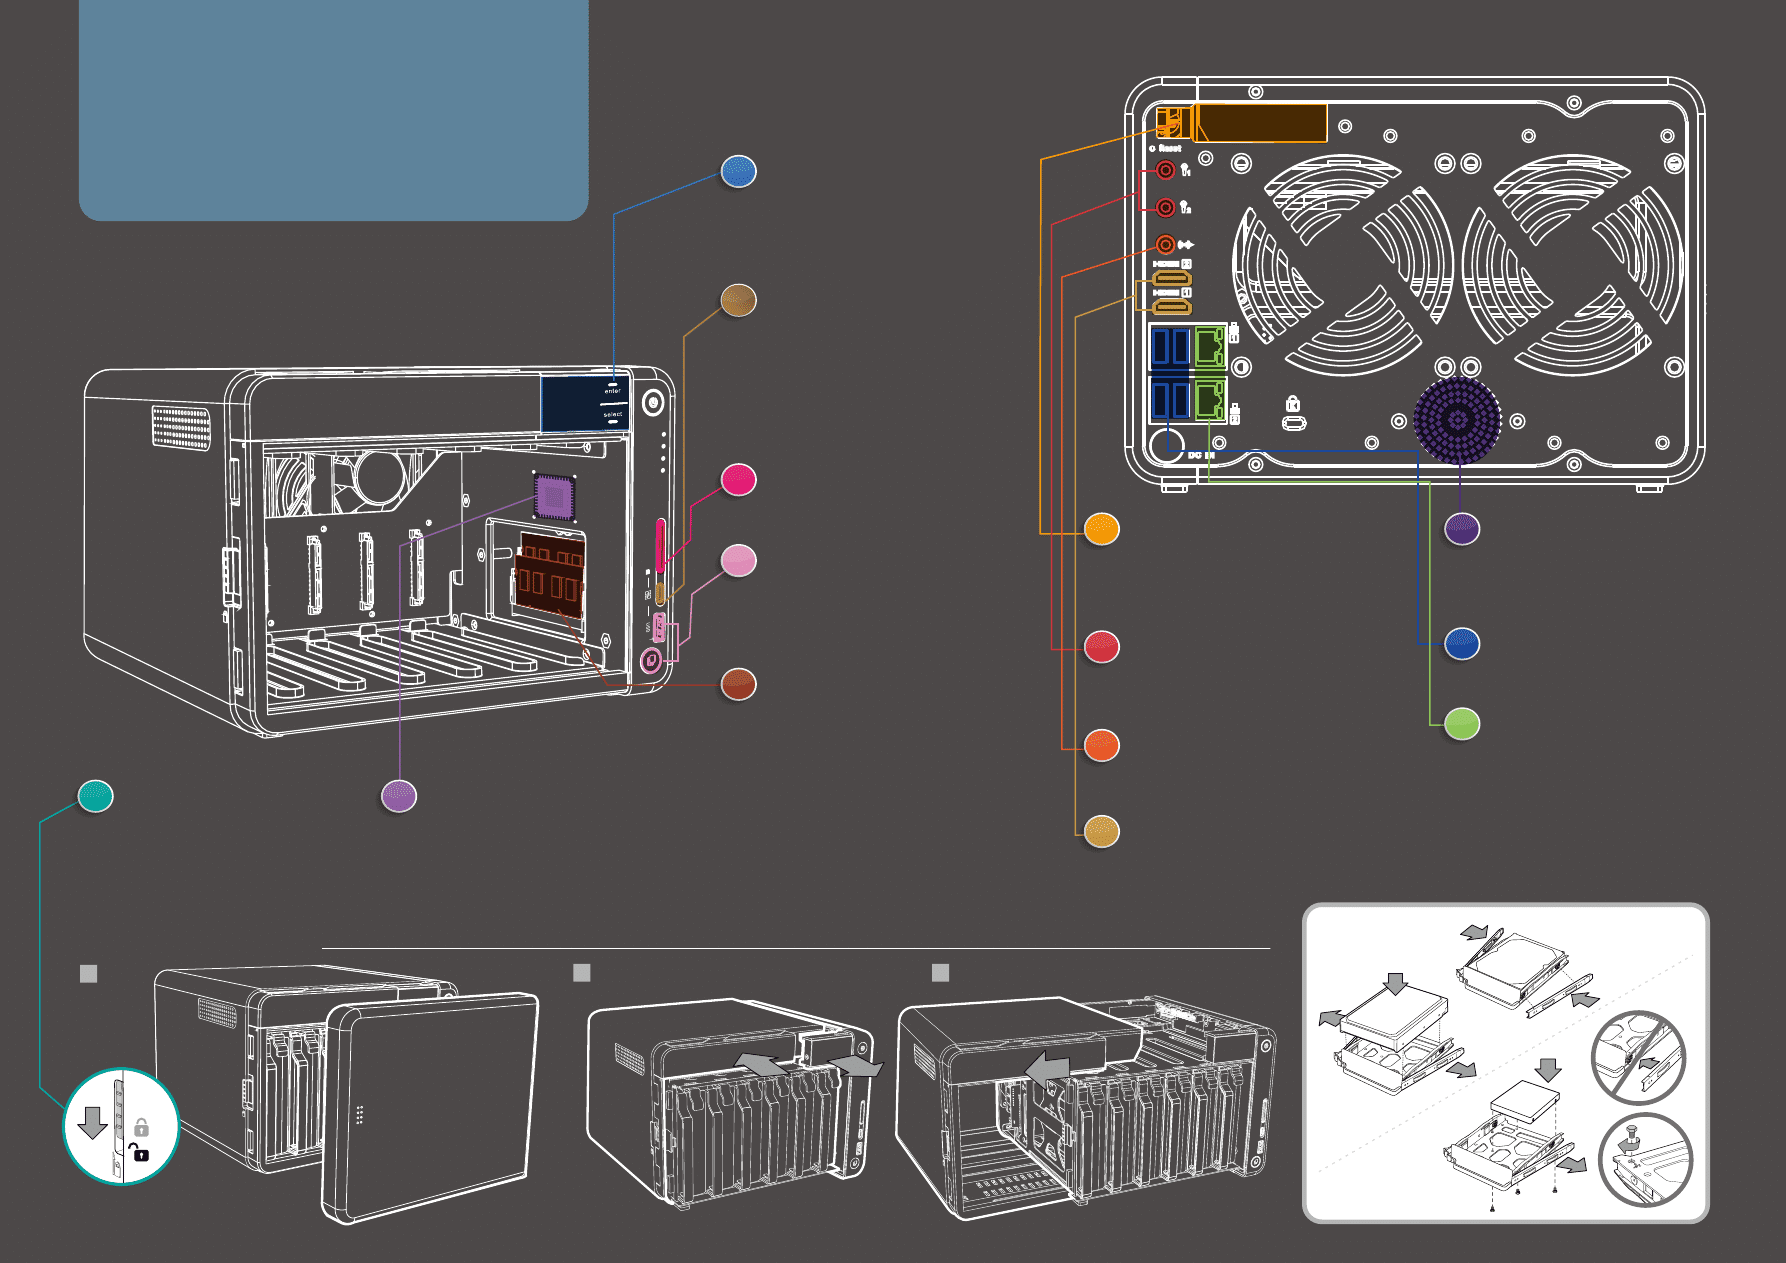 Gebrauchsinformation / Datenblatt zu QNAP Turbo Station TS-453B-8G